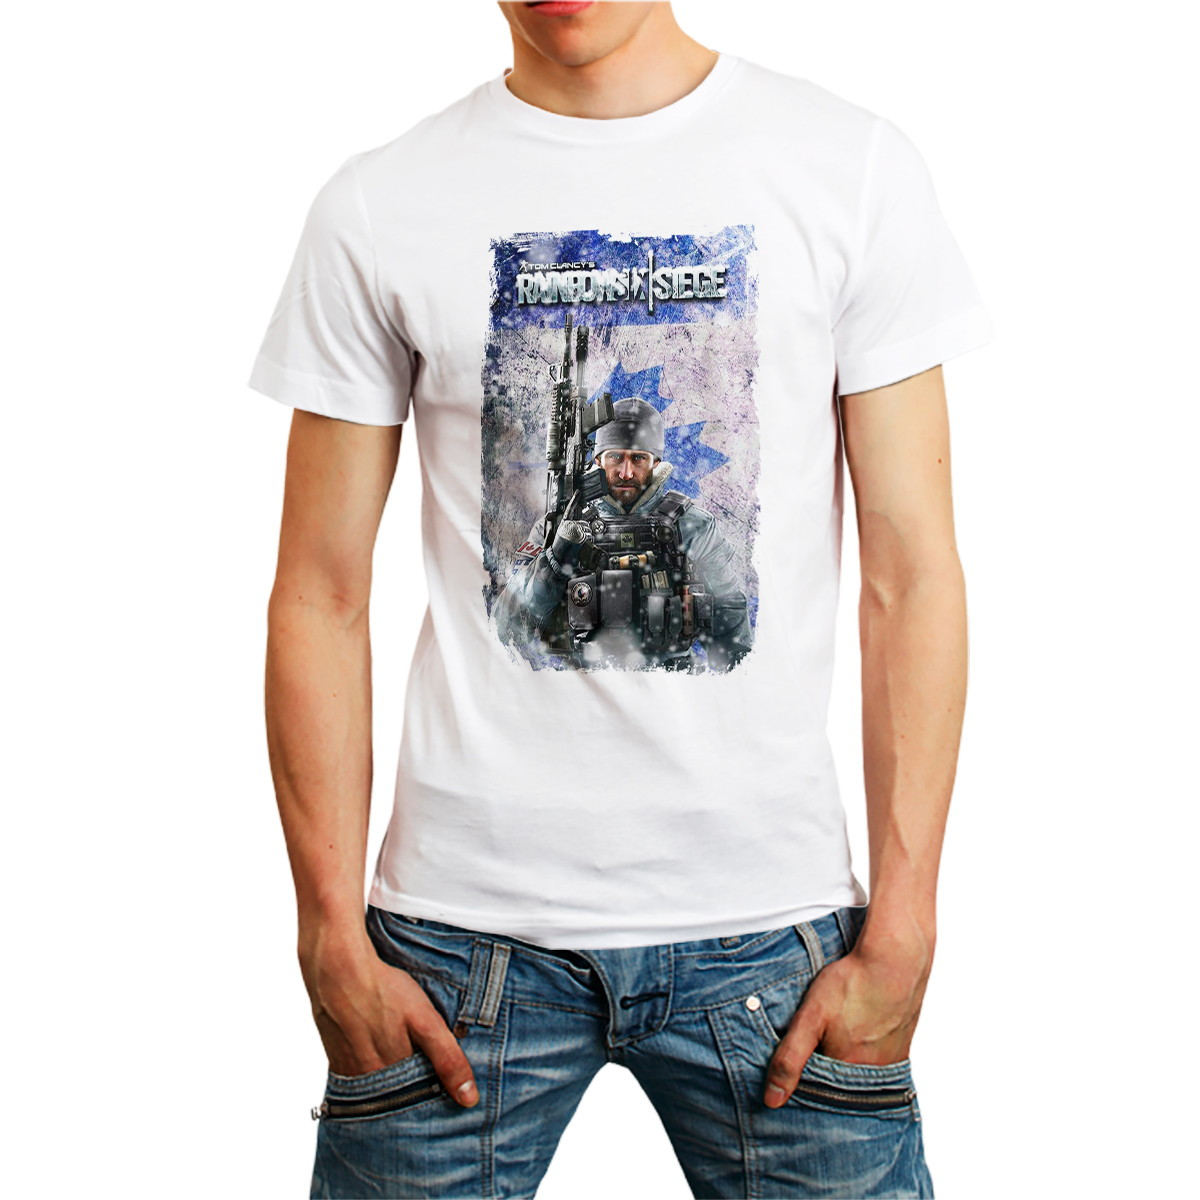 3aa5a01ff Camiseta Buck Rainbow Six Siege 6 Camisa RB6 Games Branca no Elo7 ...